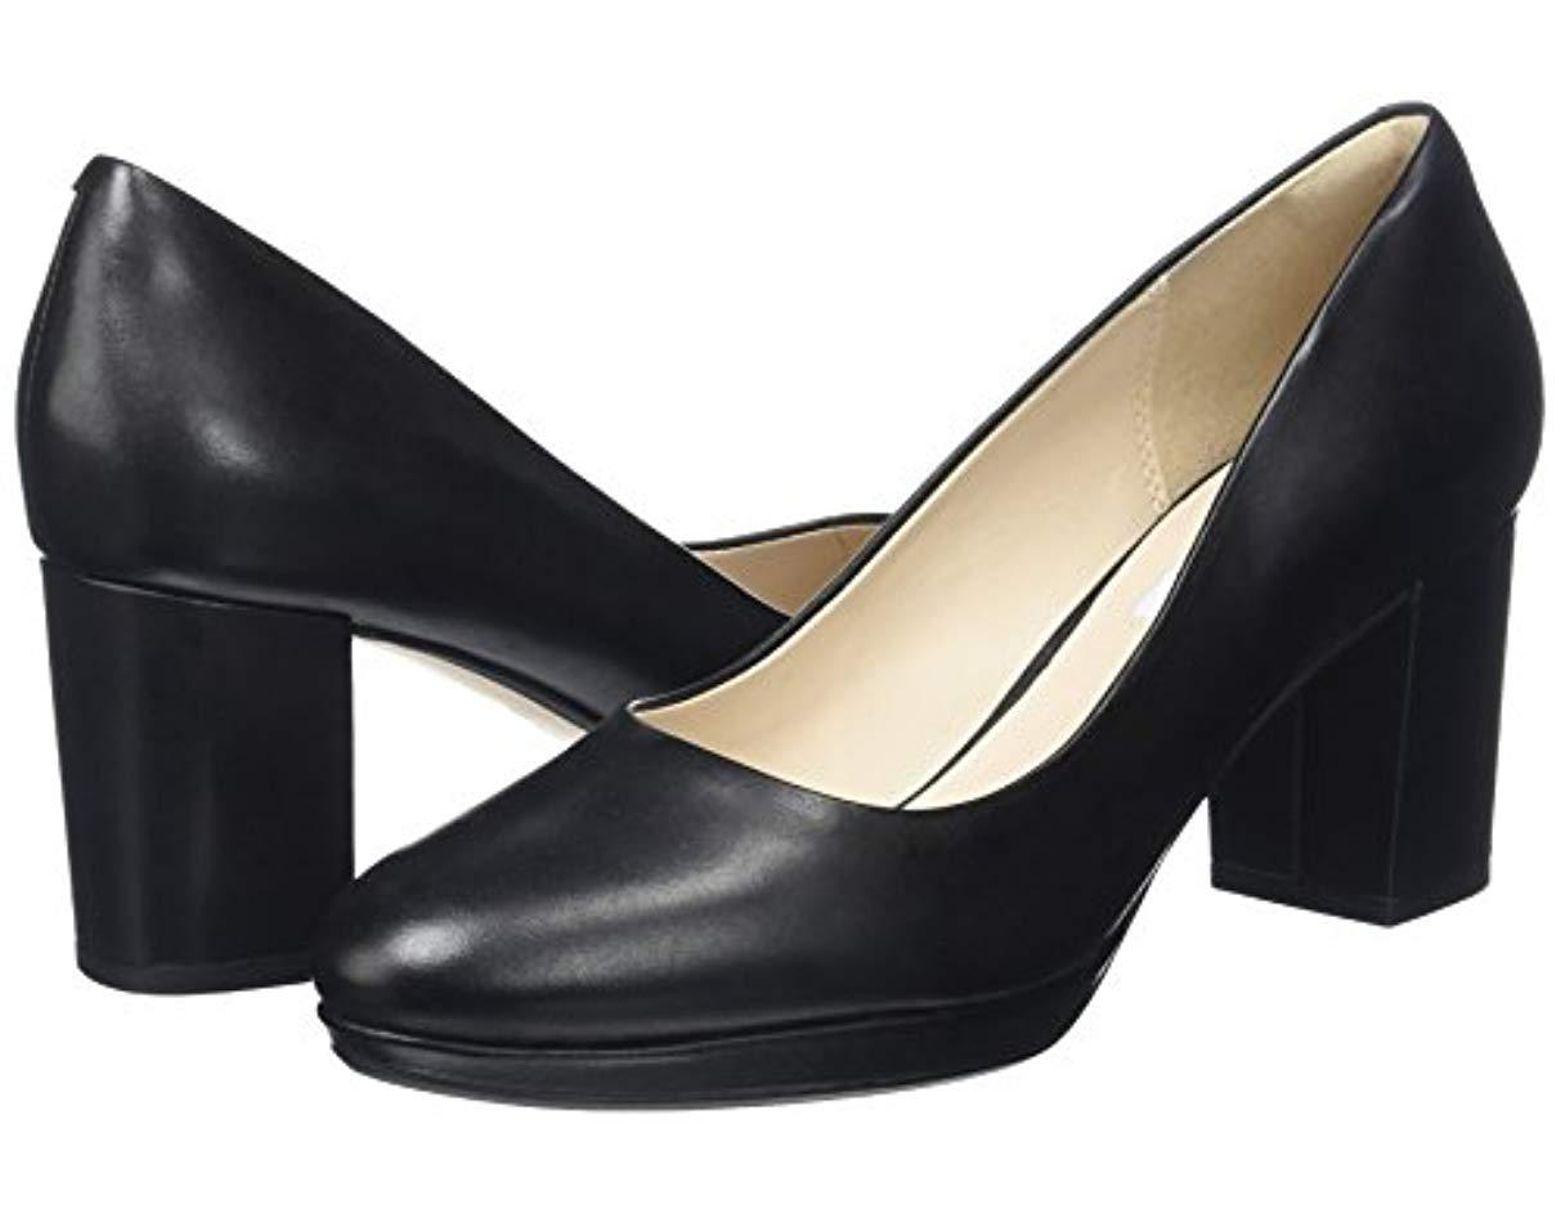 925fdd6f2ecc5 Clarks Kelda Hope Closed Toe Heels in Black - Lyst